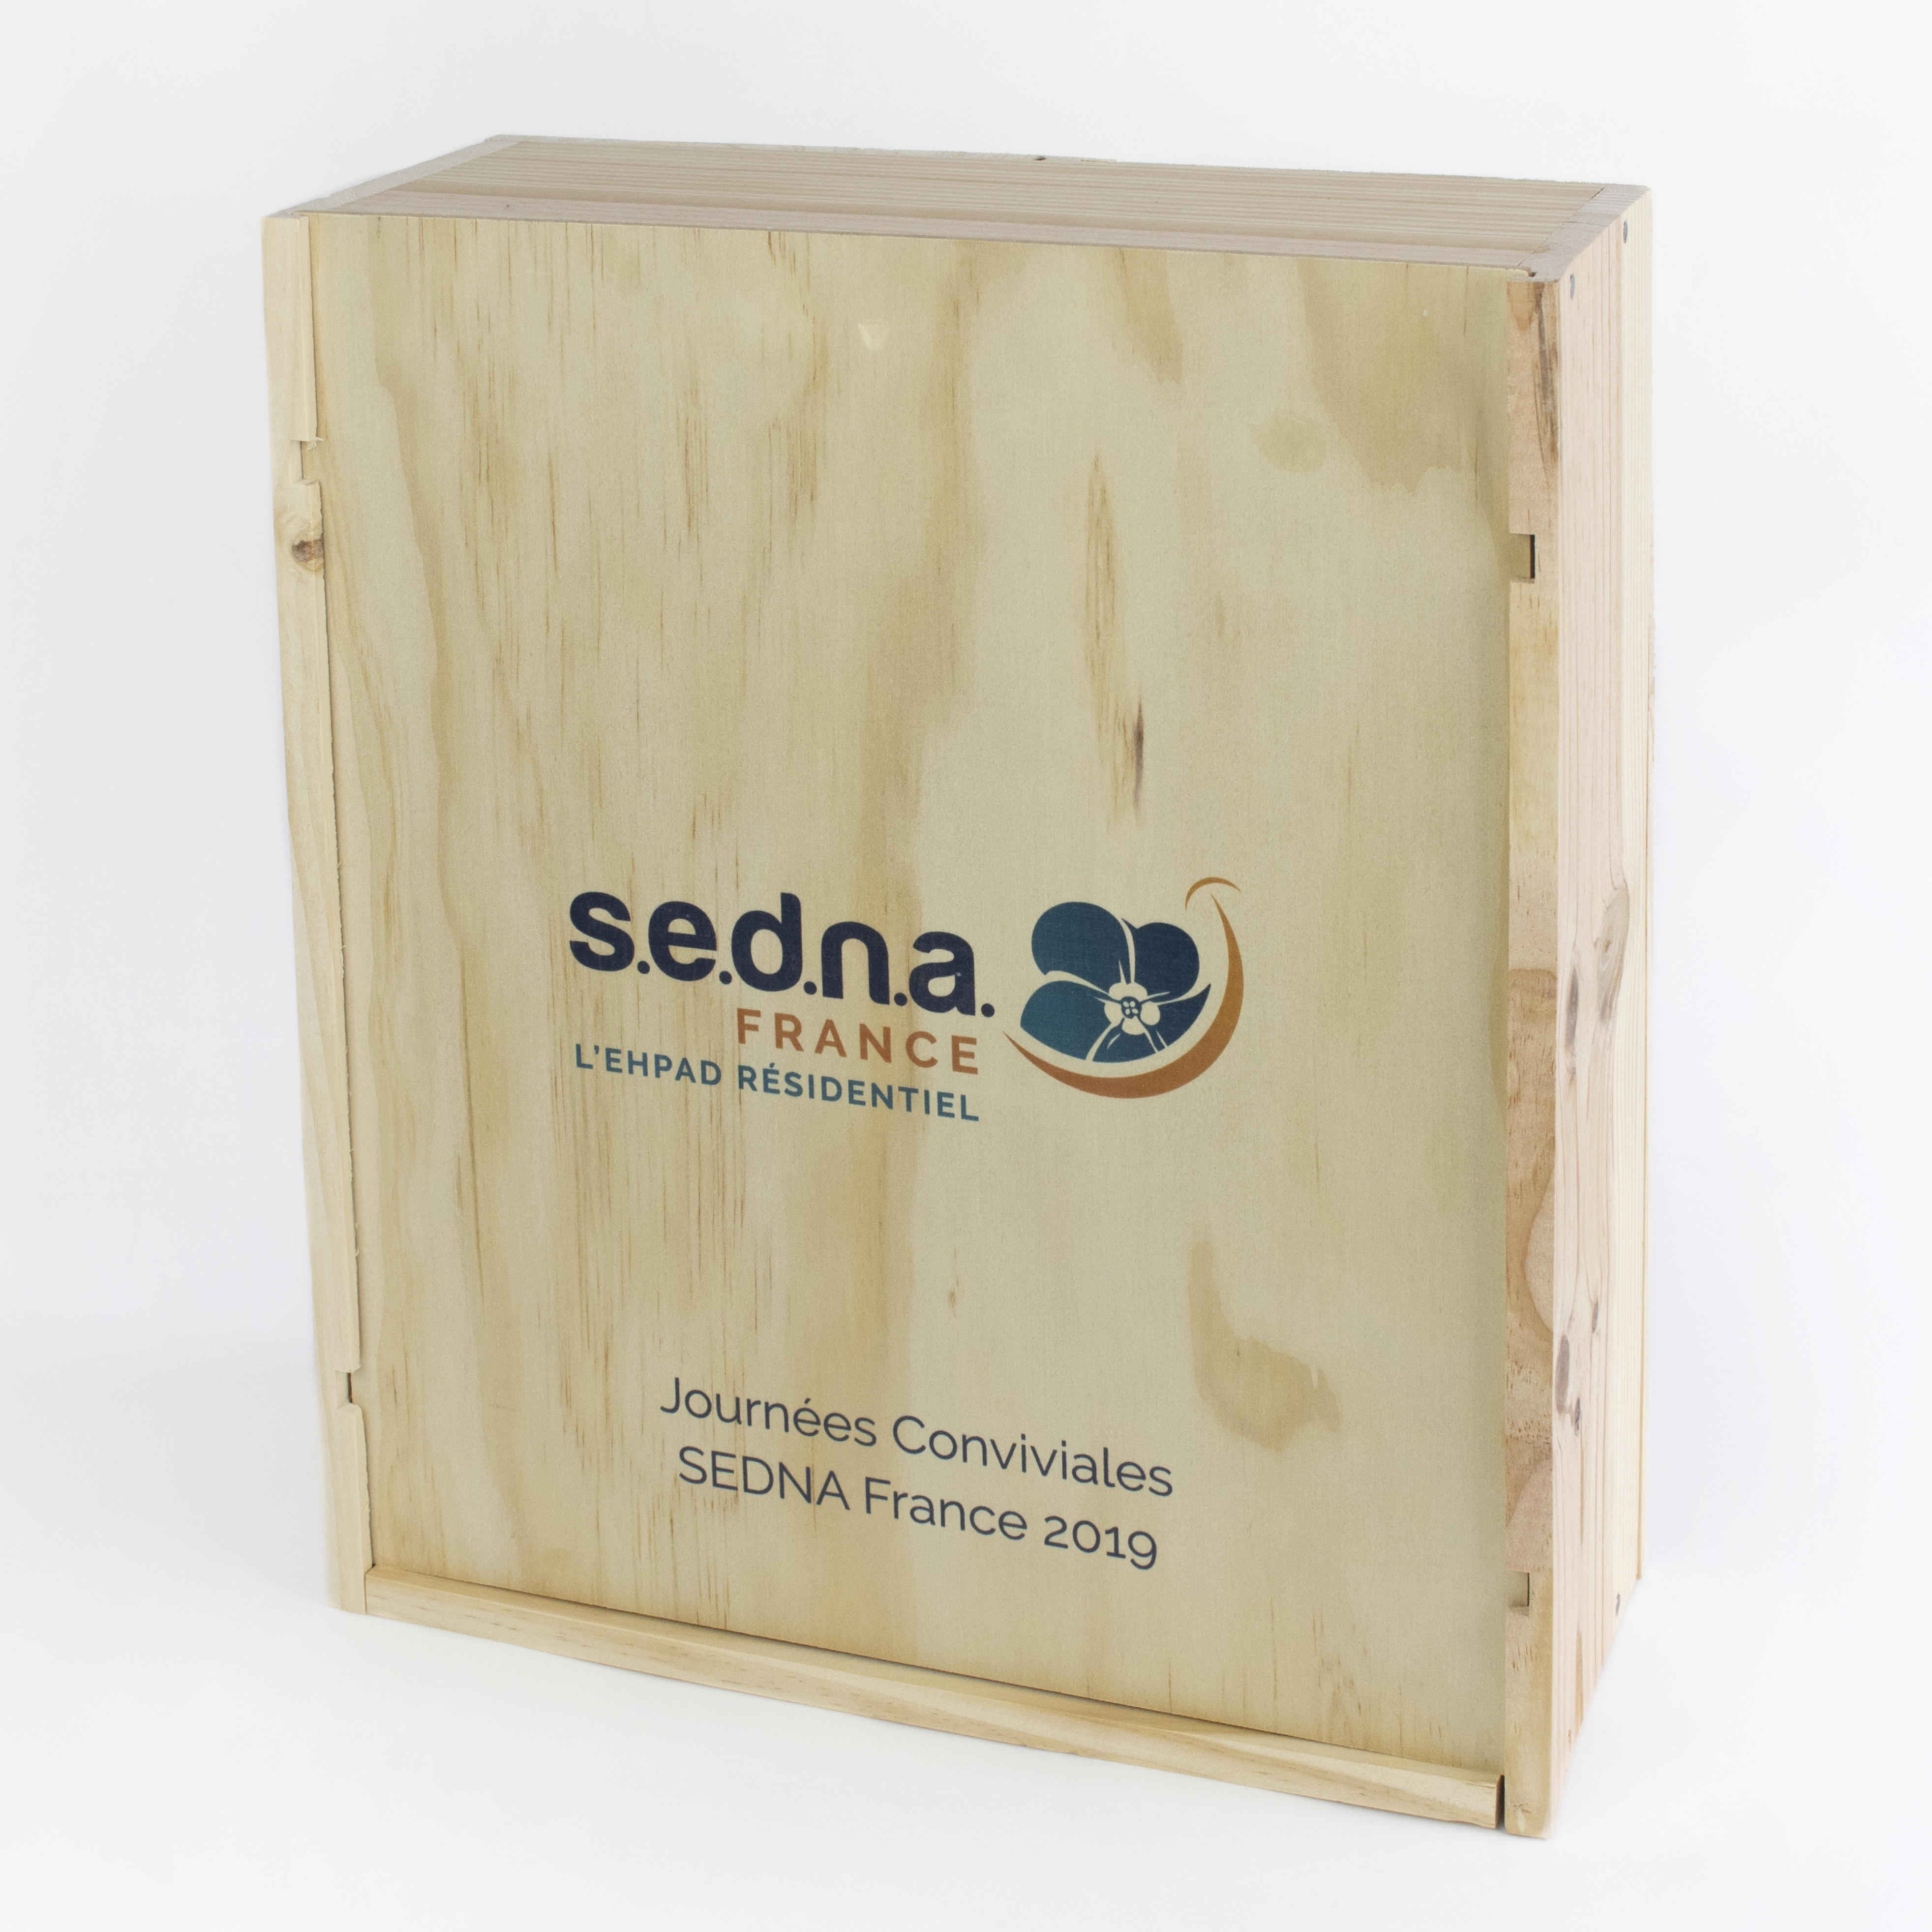 Coffret personnalisé SEDNA France - lehpad.jpg